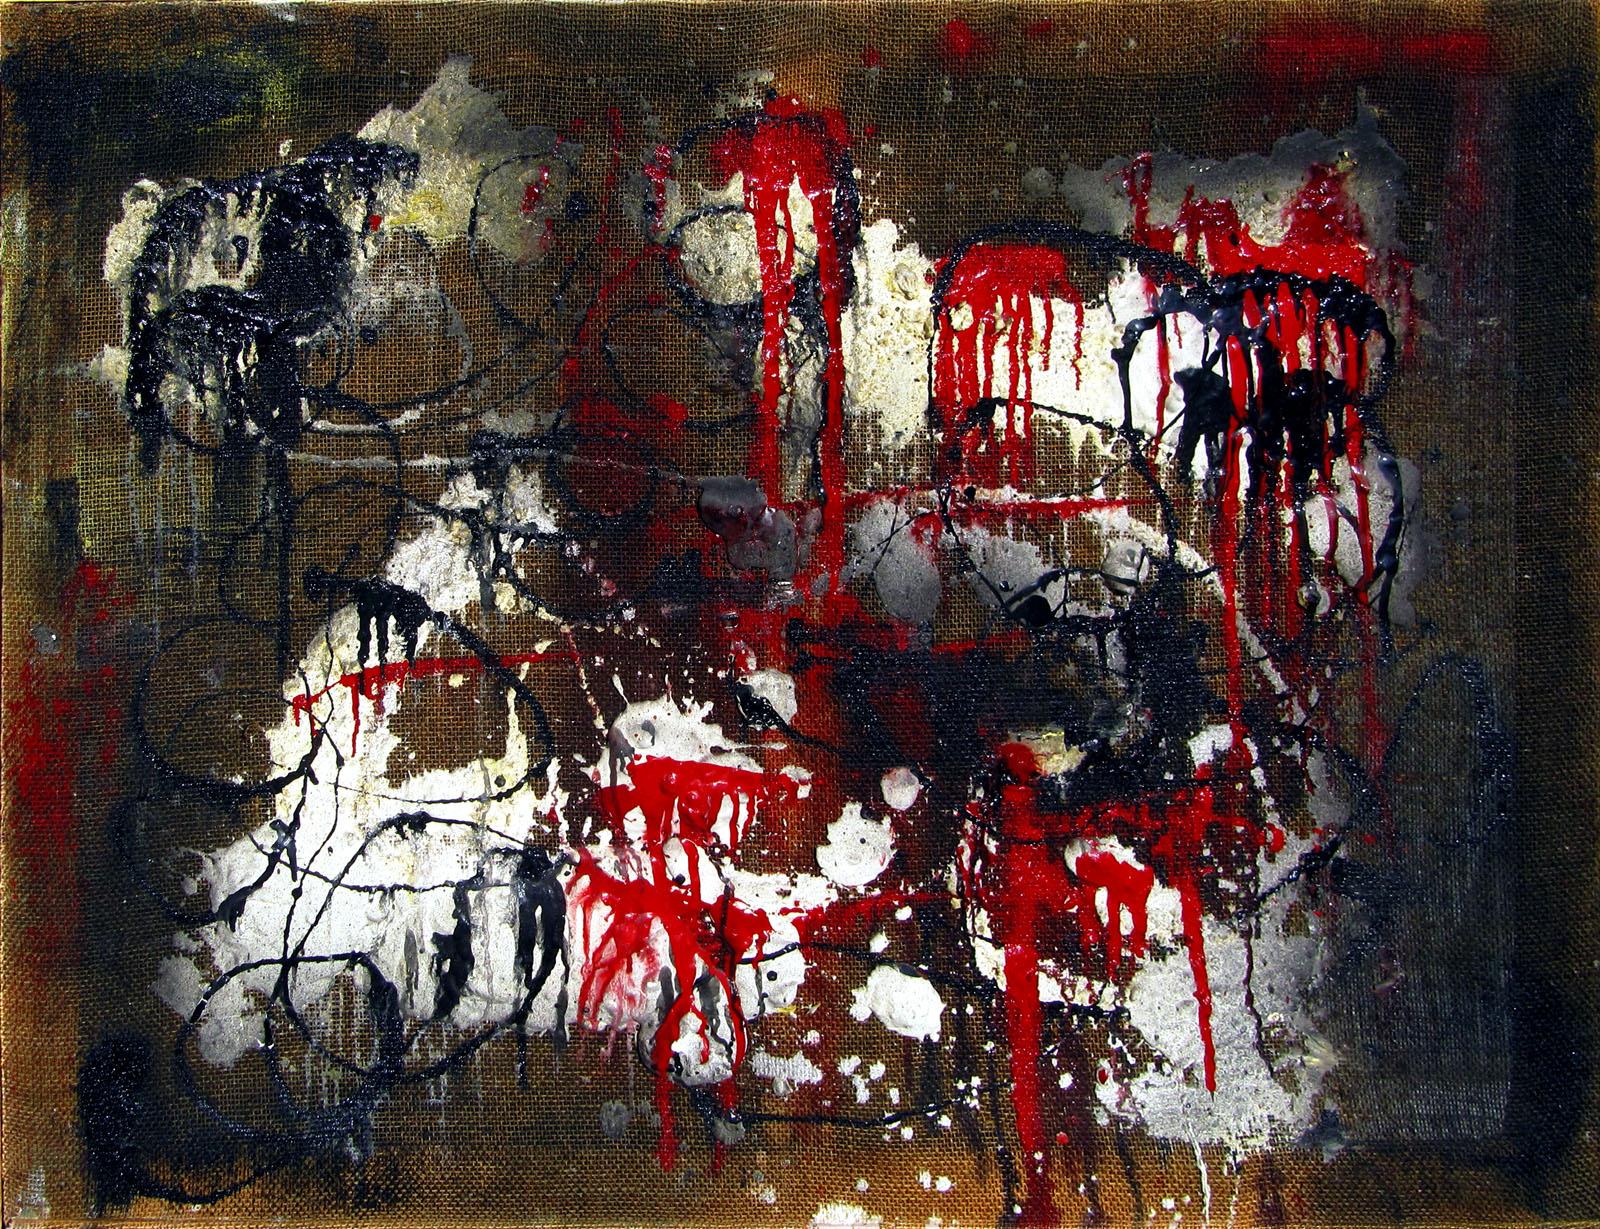 panies-danielvillalobos-spanish-painting-abstractexpressionism-9